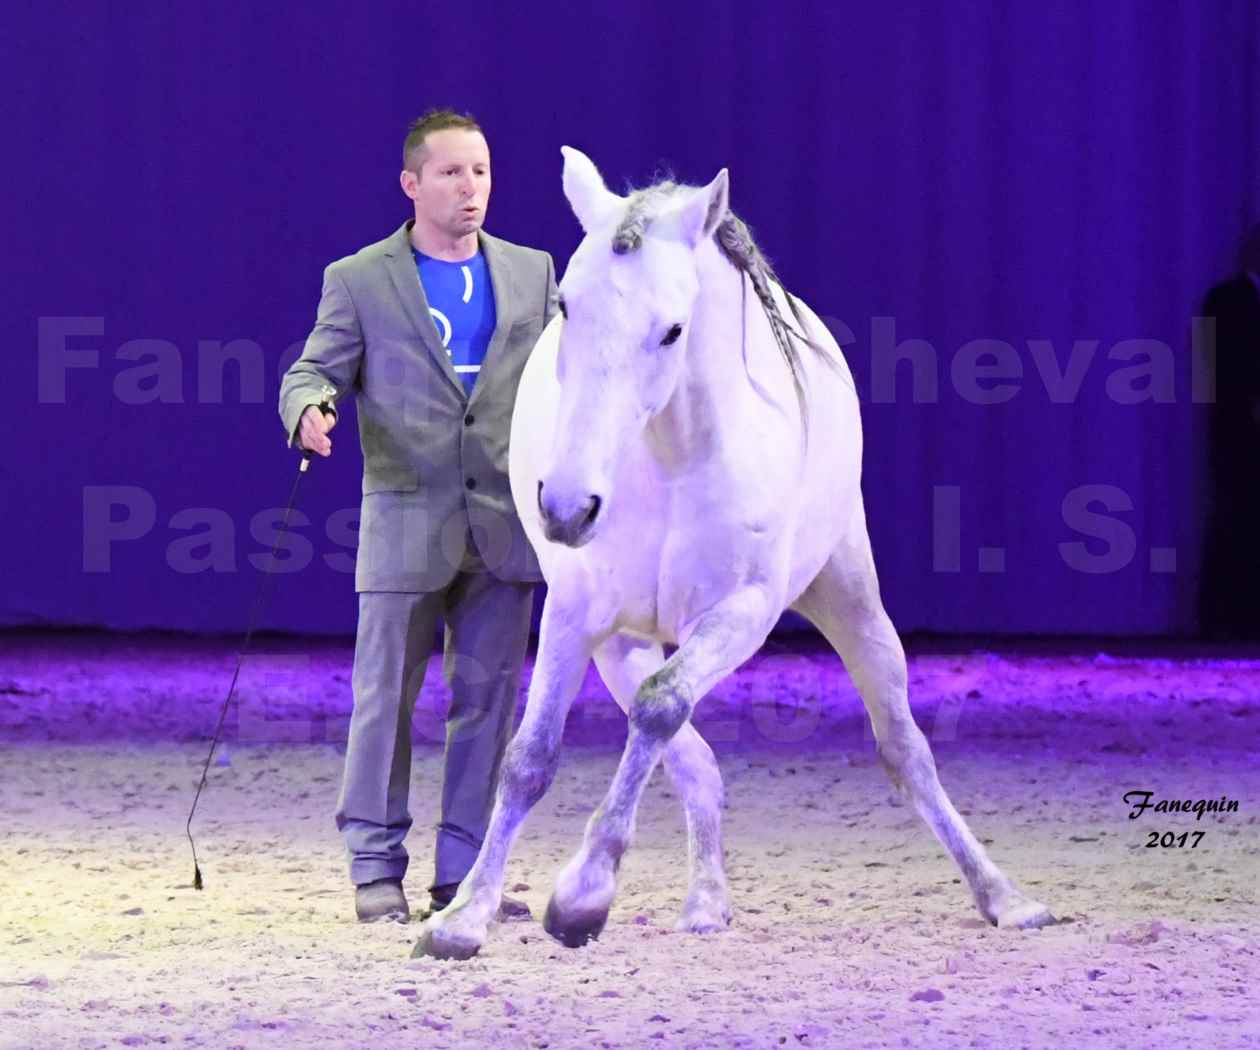 Cheval Passion 2017 - M. I. S. E. C. - Ludovic LONGO & 1 cheval en liberté - 09